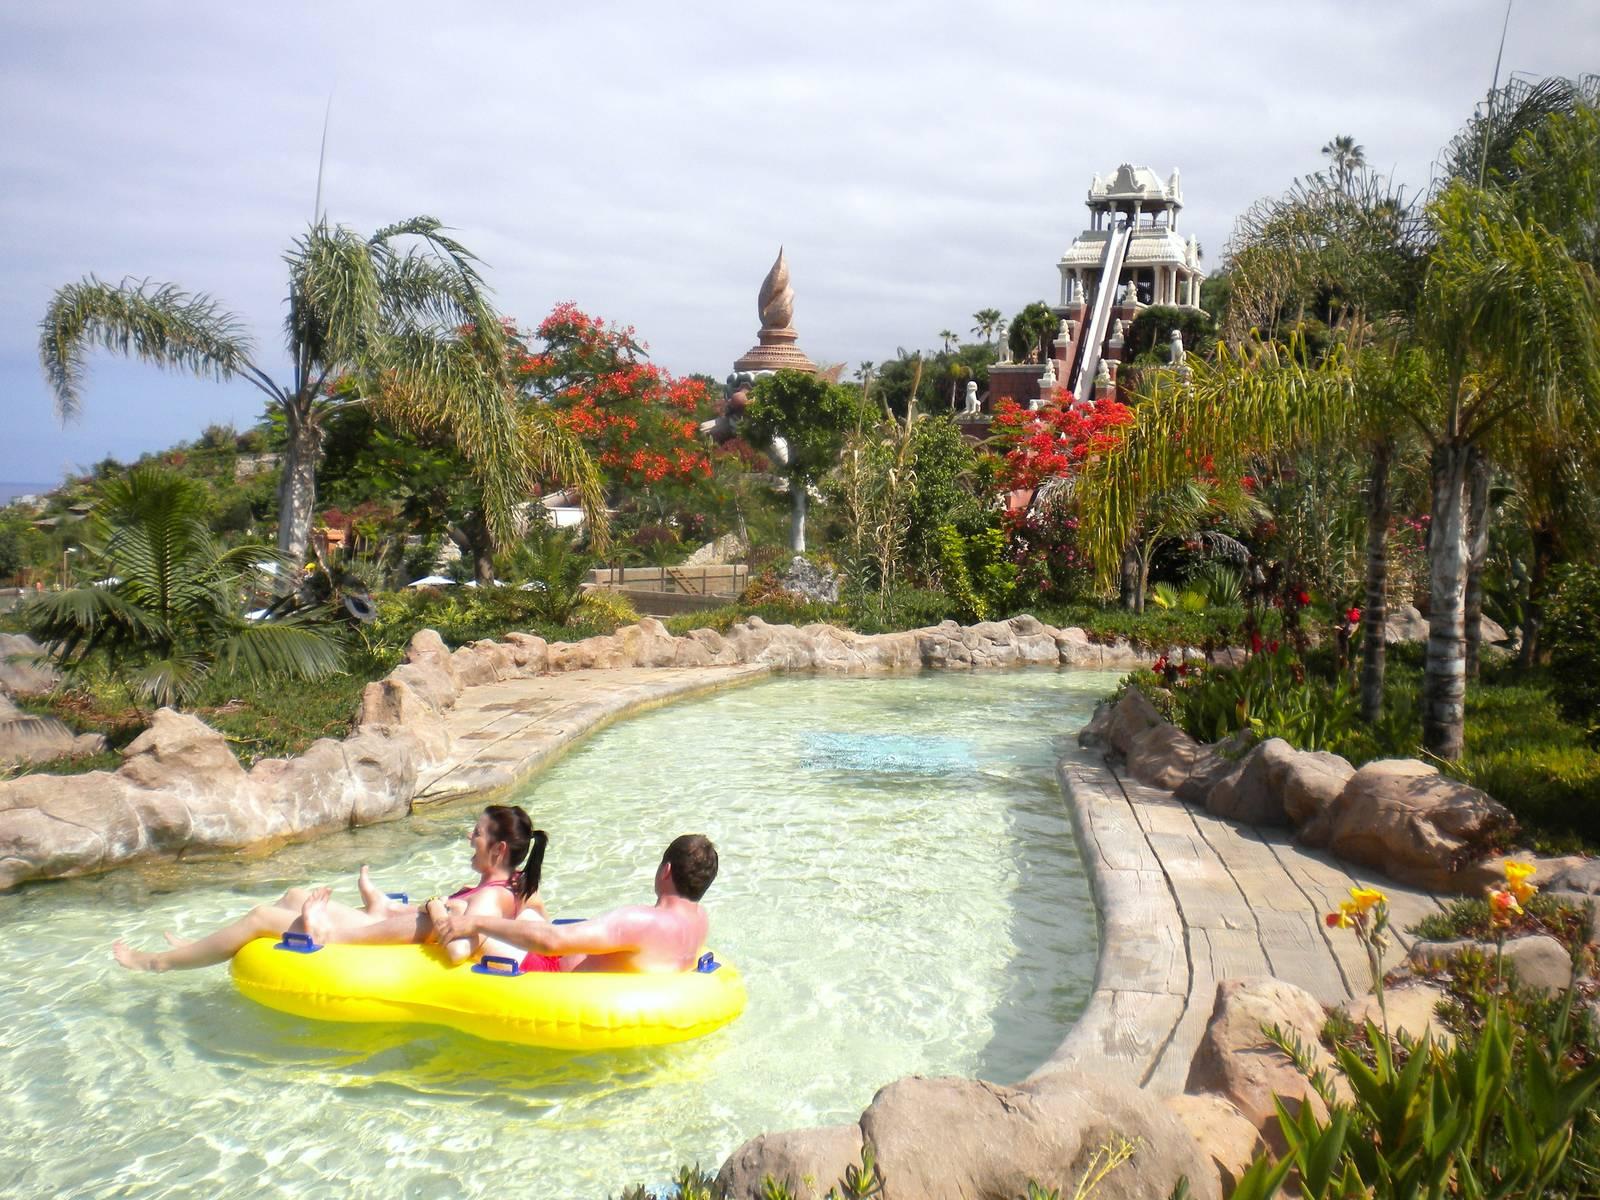 siam park3 Siam Park More Than a Water Park